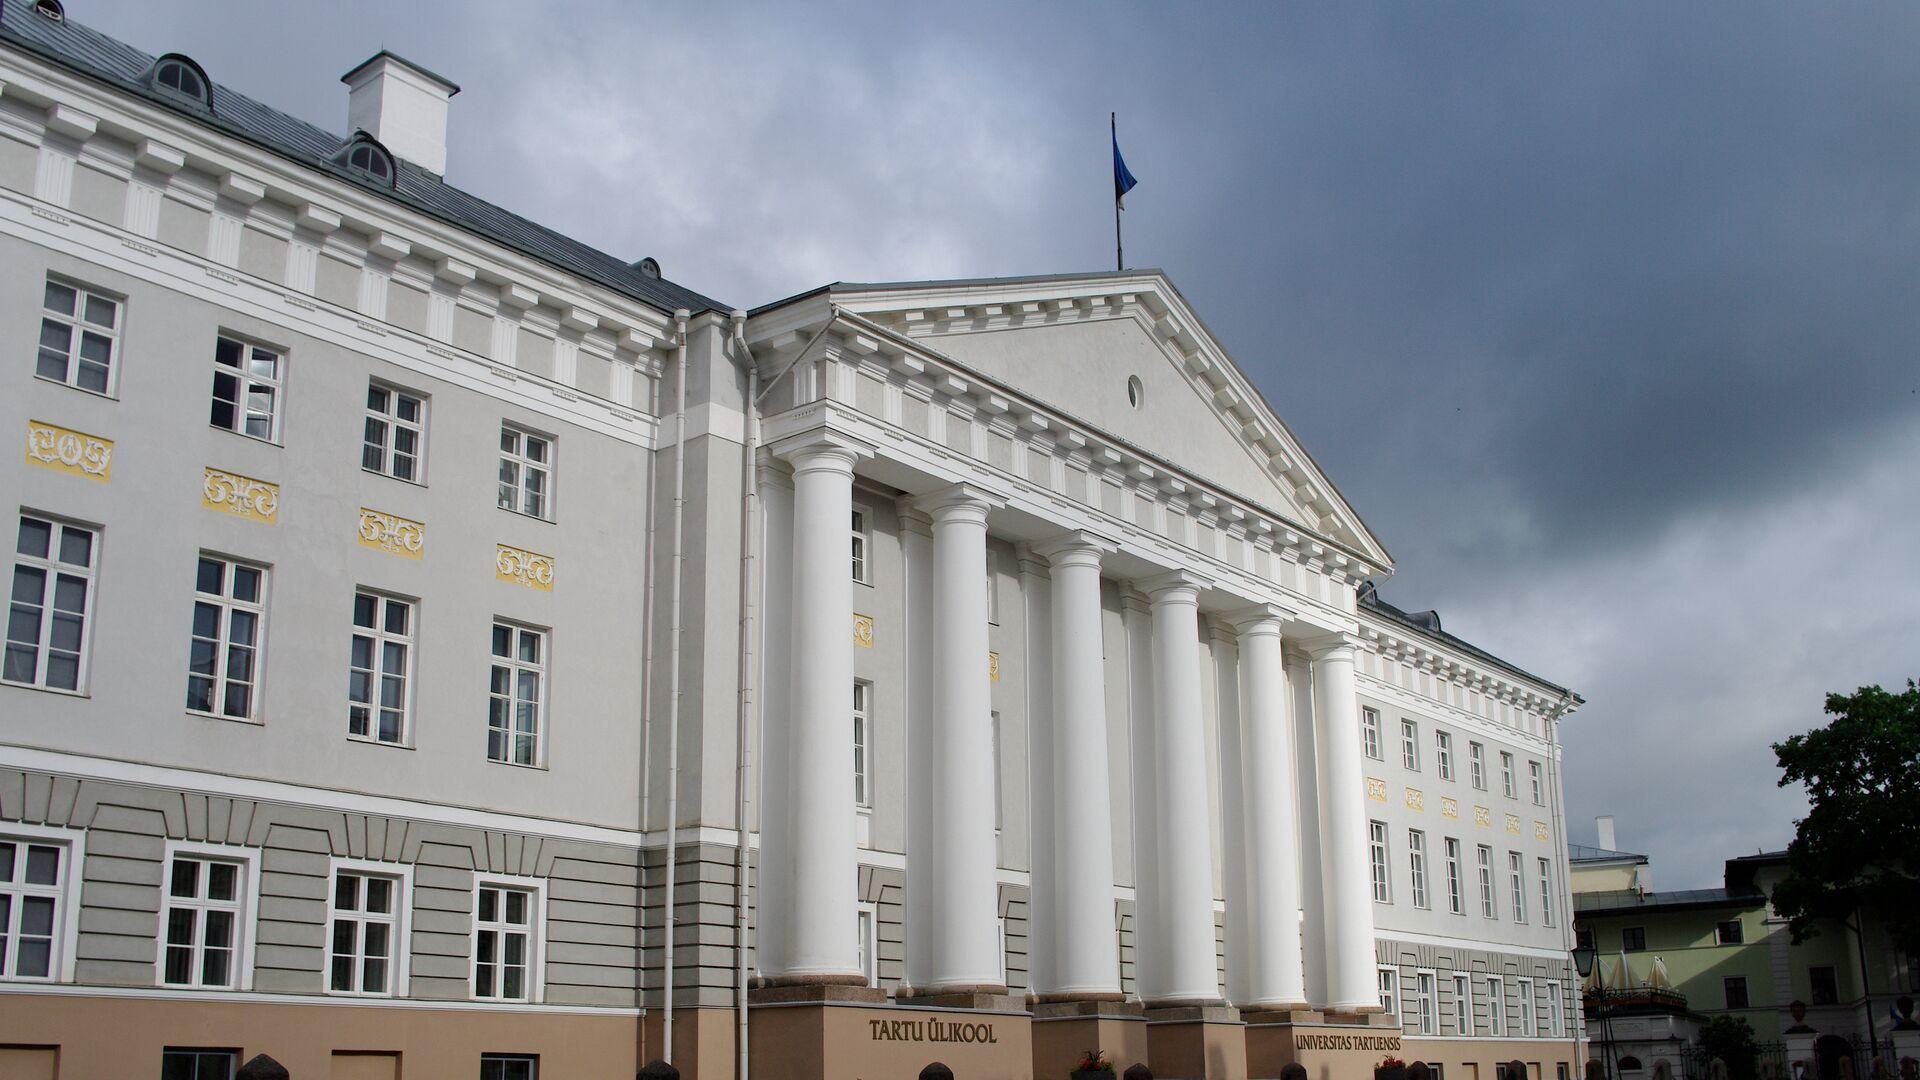 Тартуский университет - Sputnik Латвия, 1920, 09.06.2021